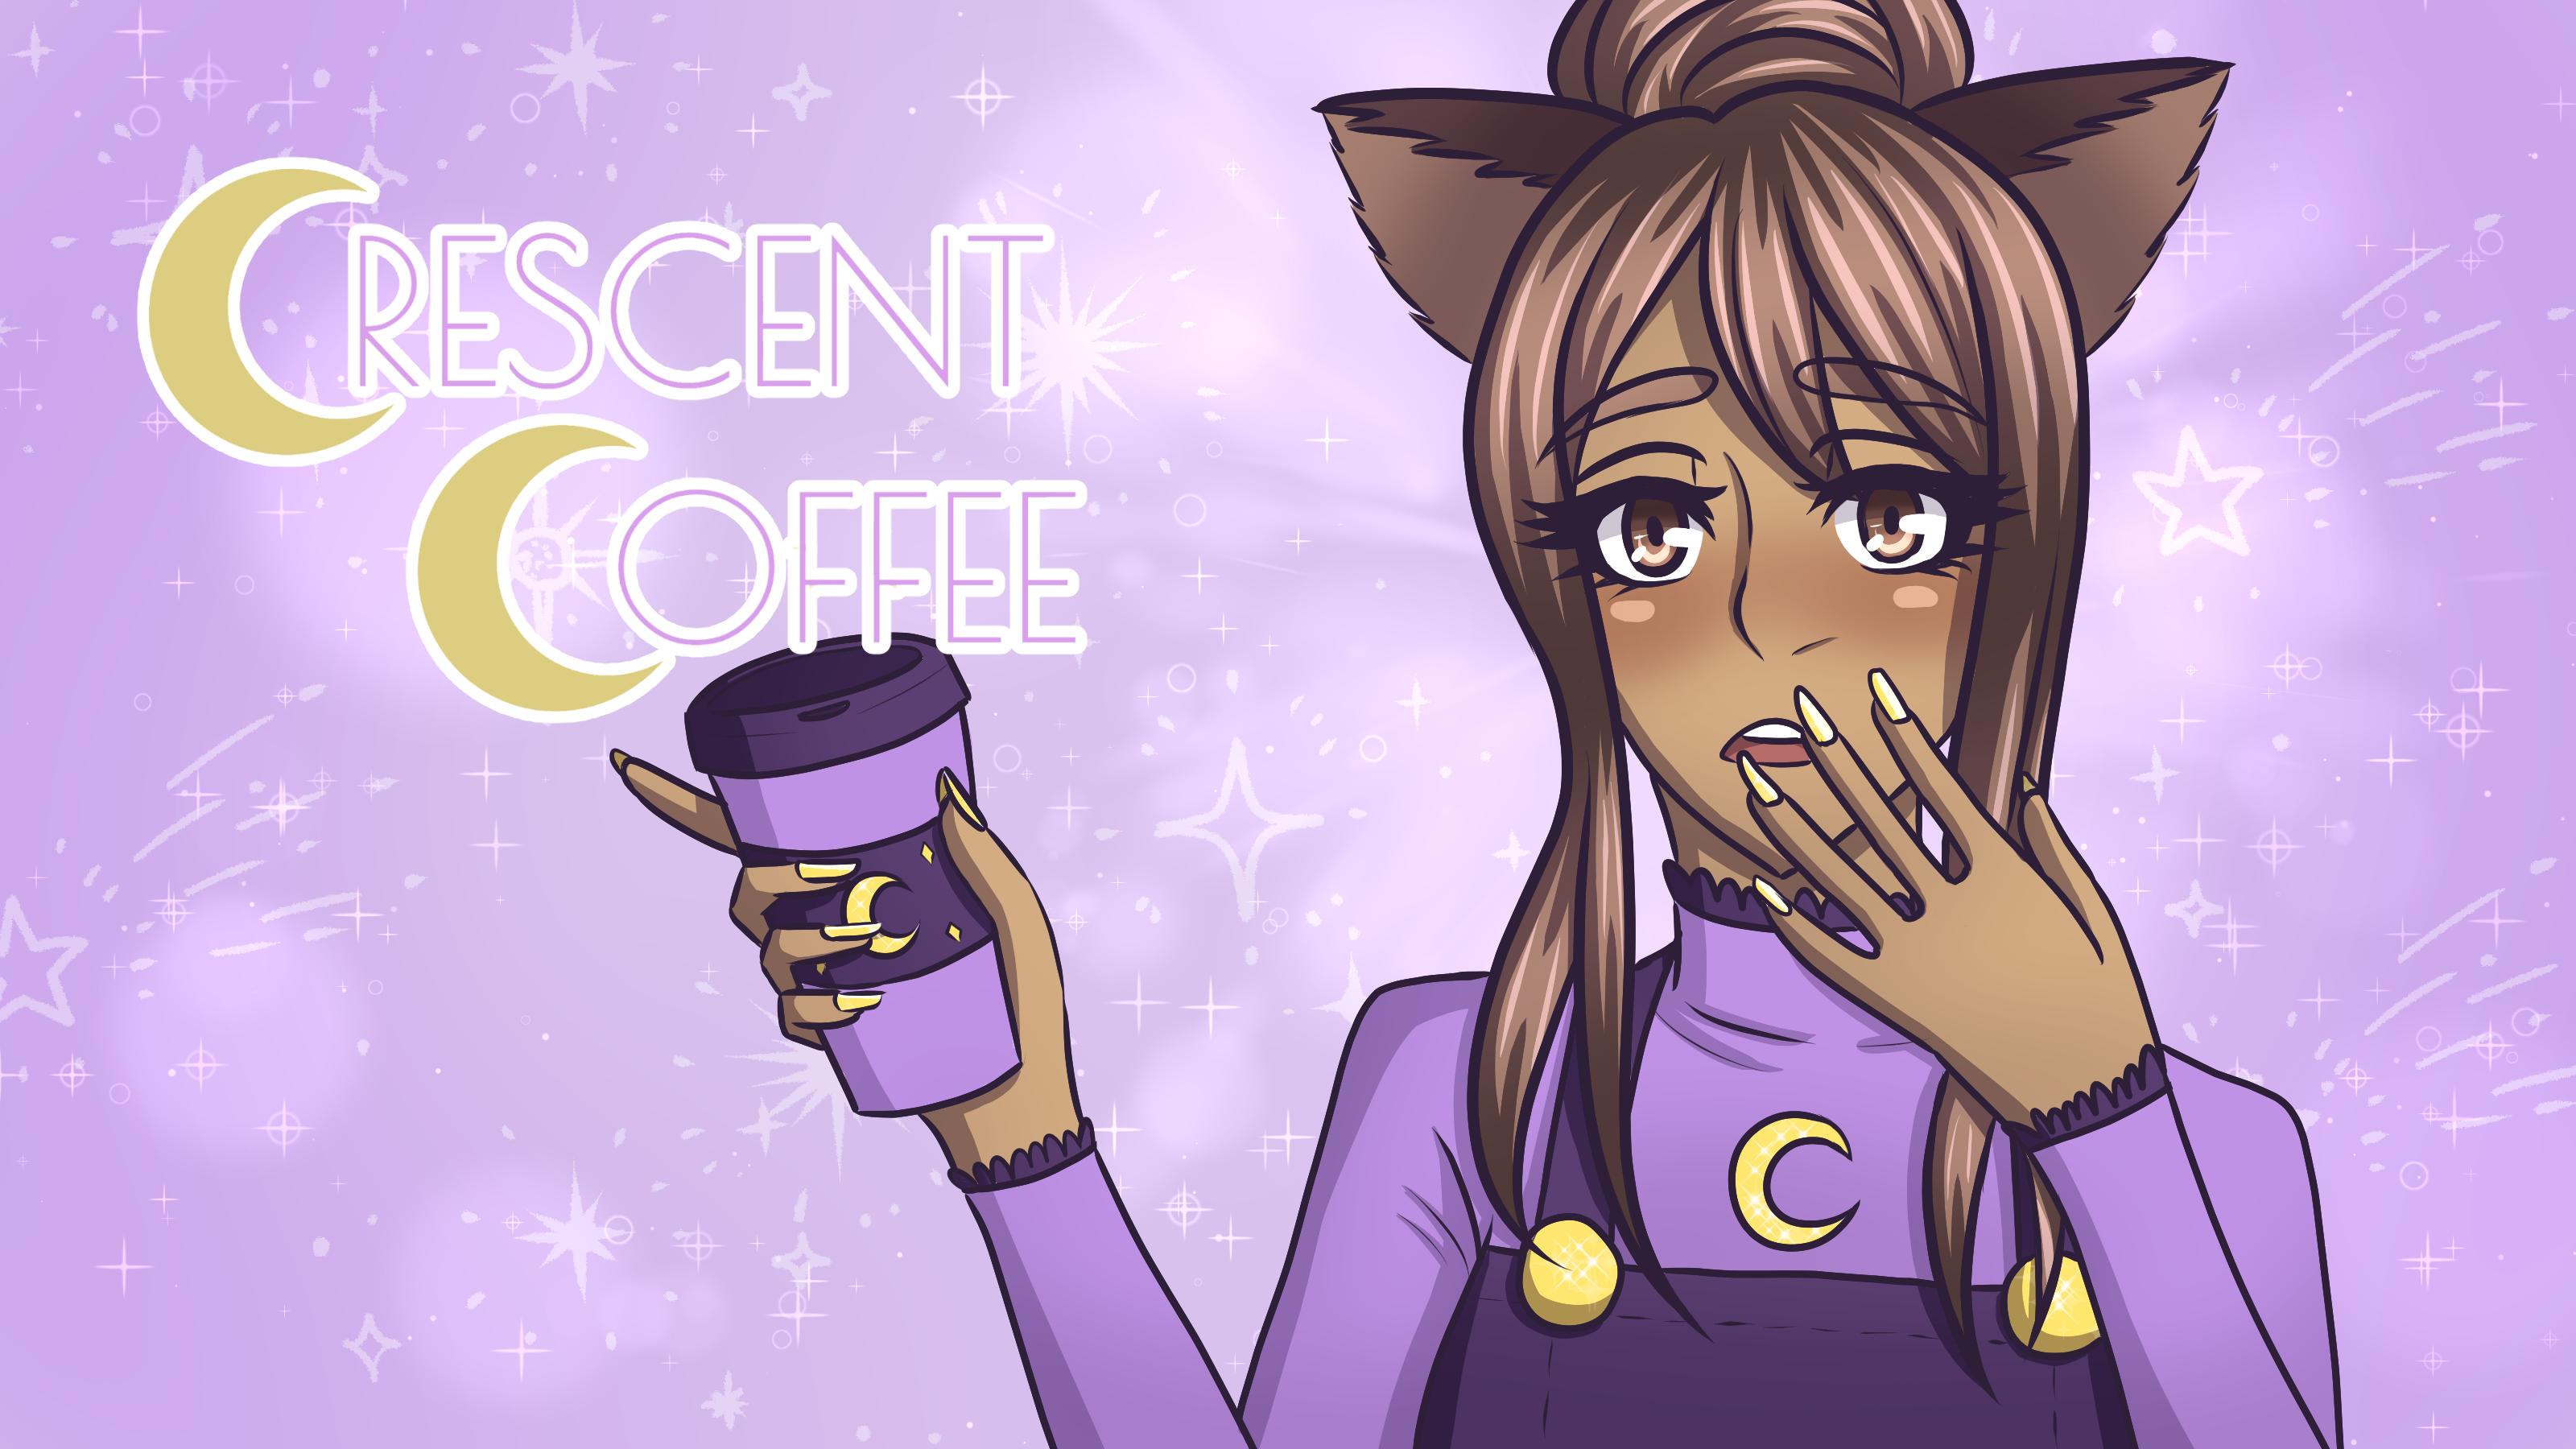 Crescent Coffee